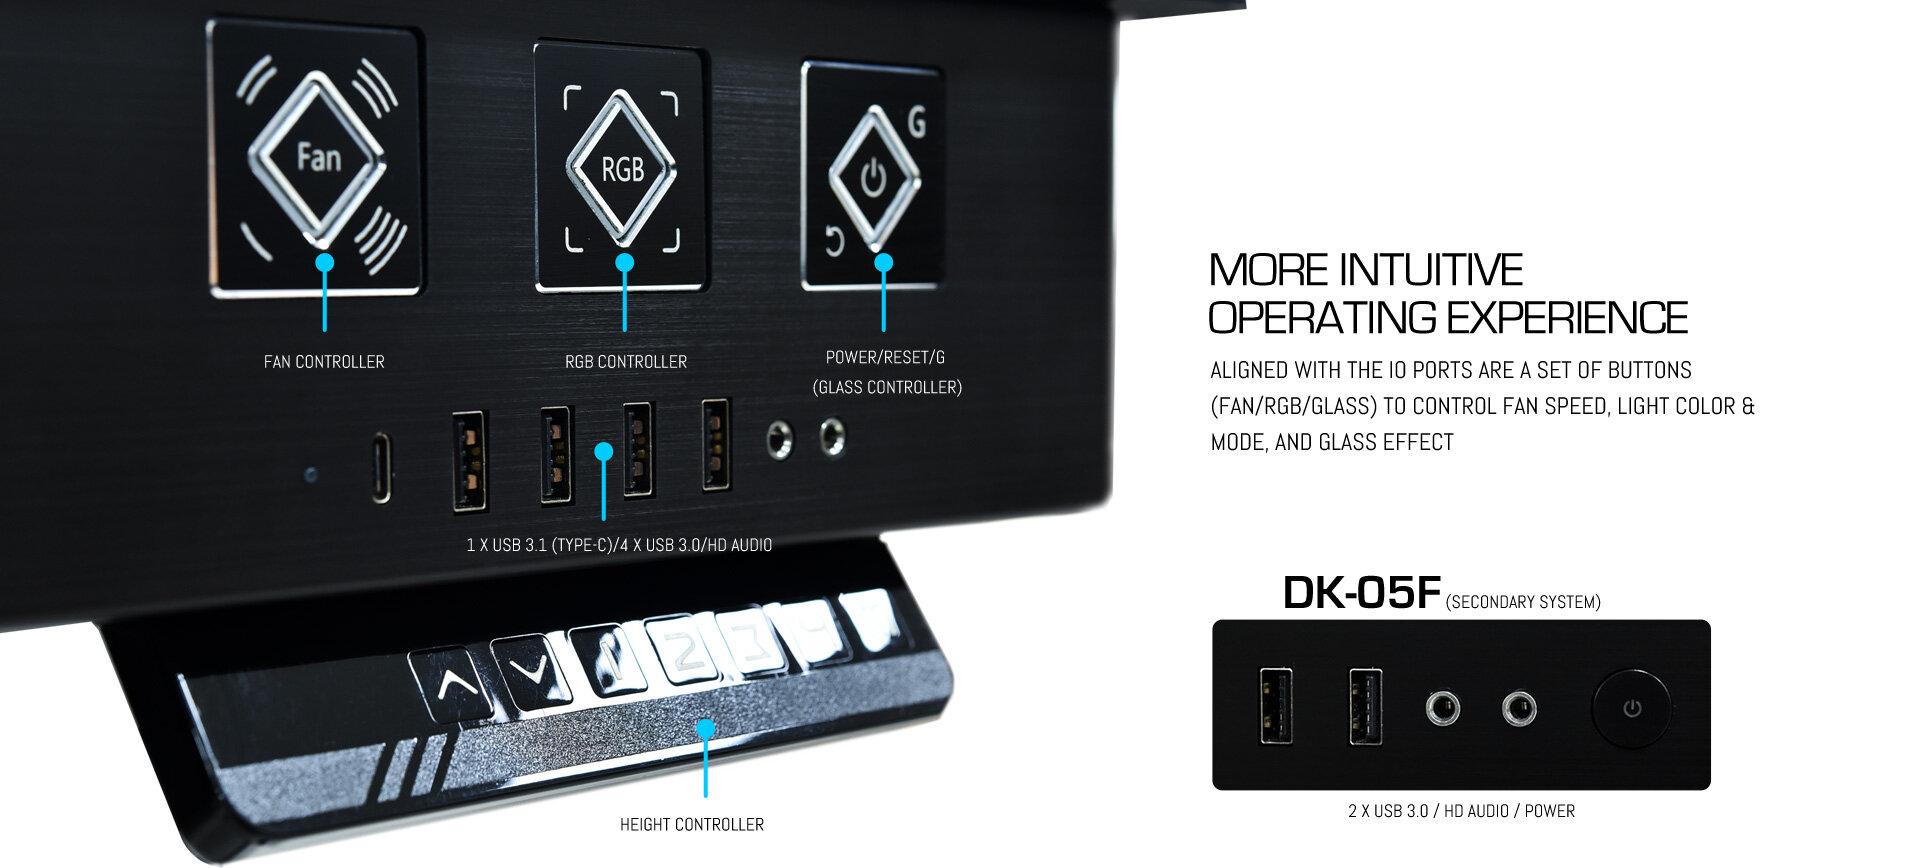 Lian Li DK-04F & DK-05F